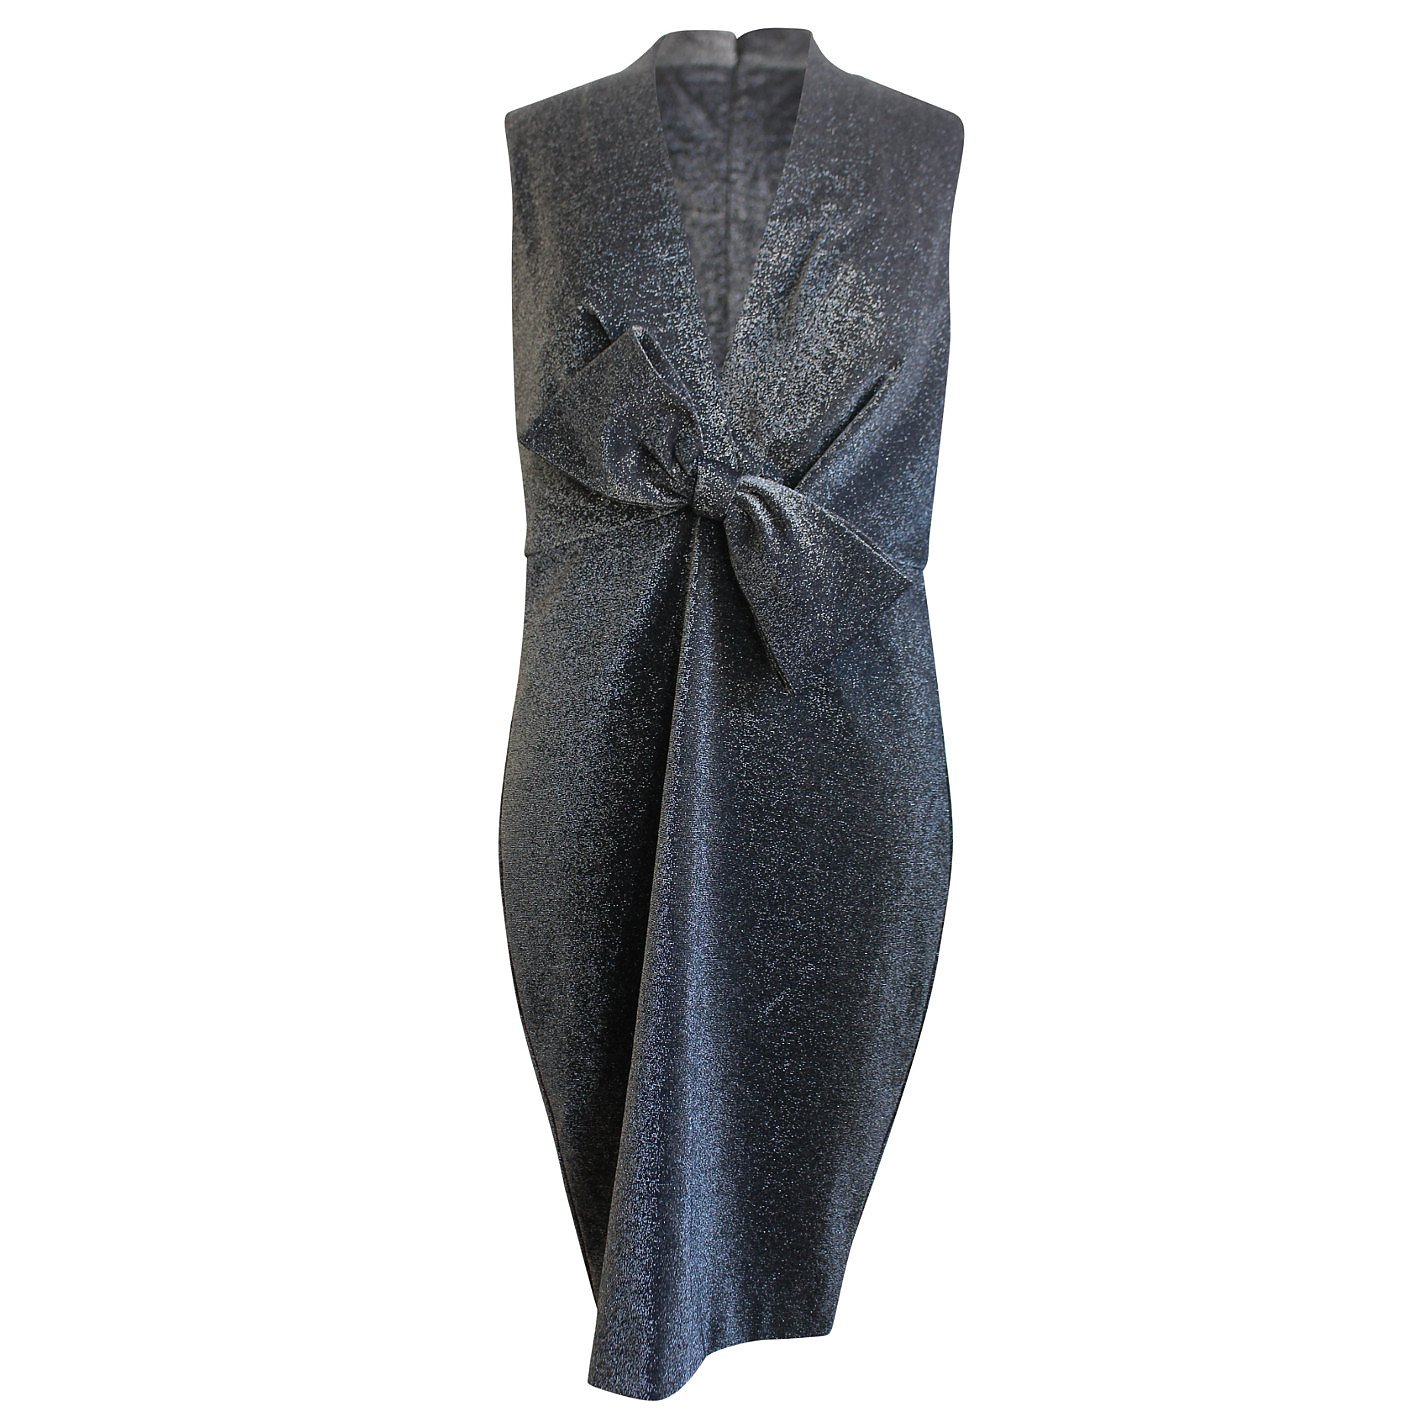 Badgley Mischka Metallic Mini Dress